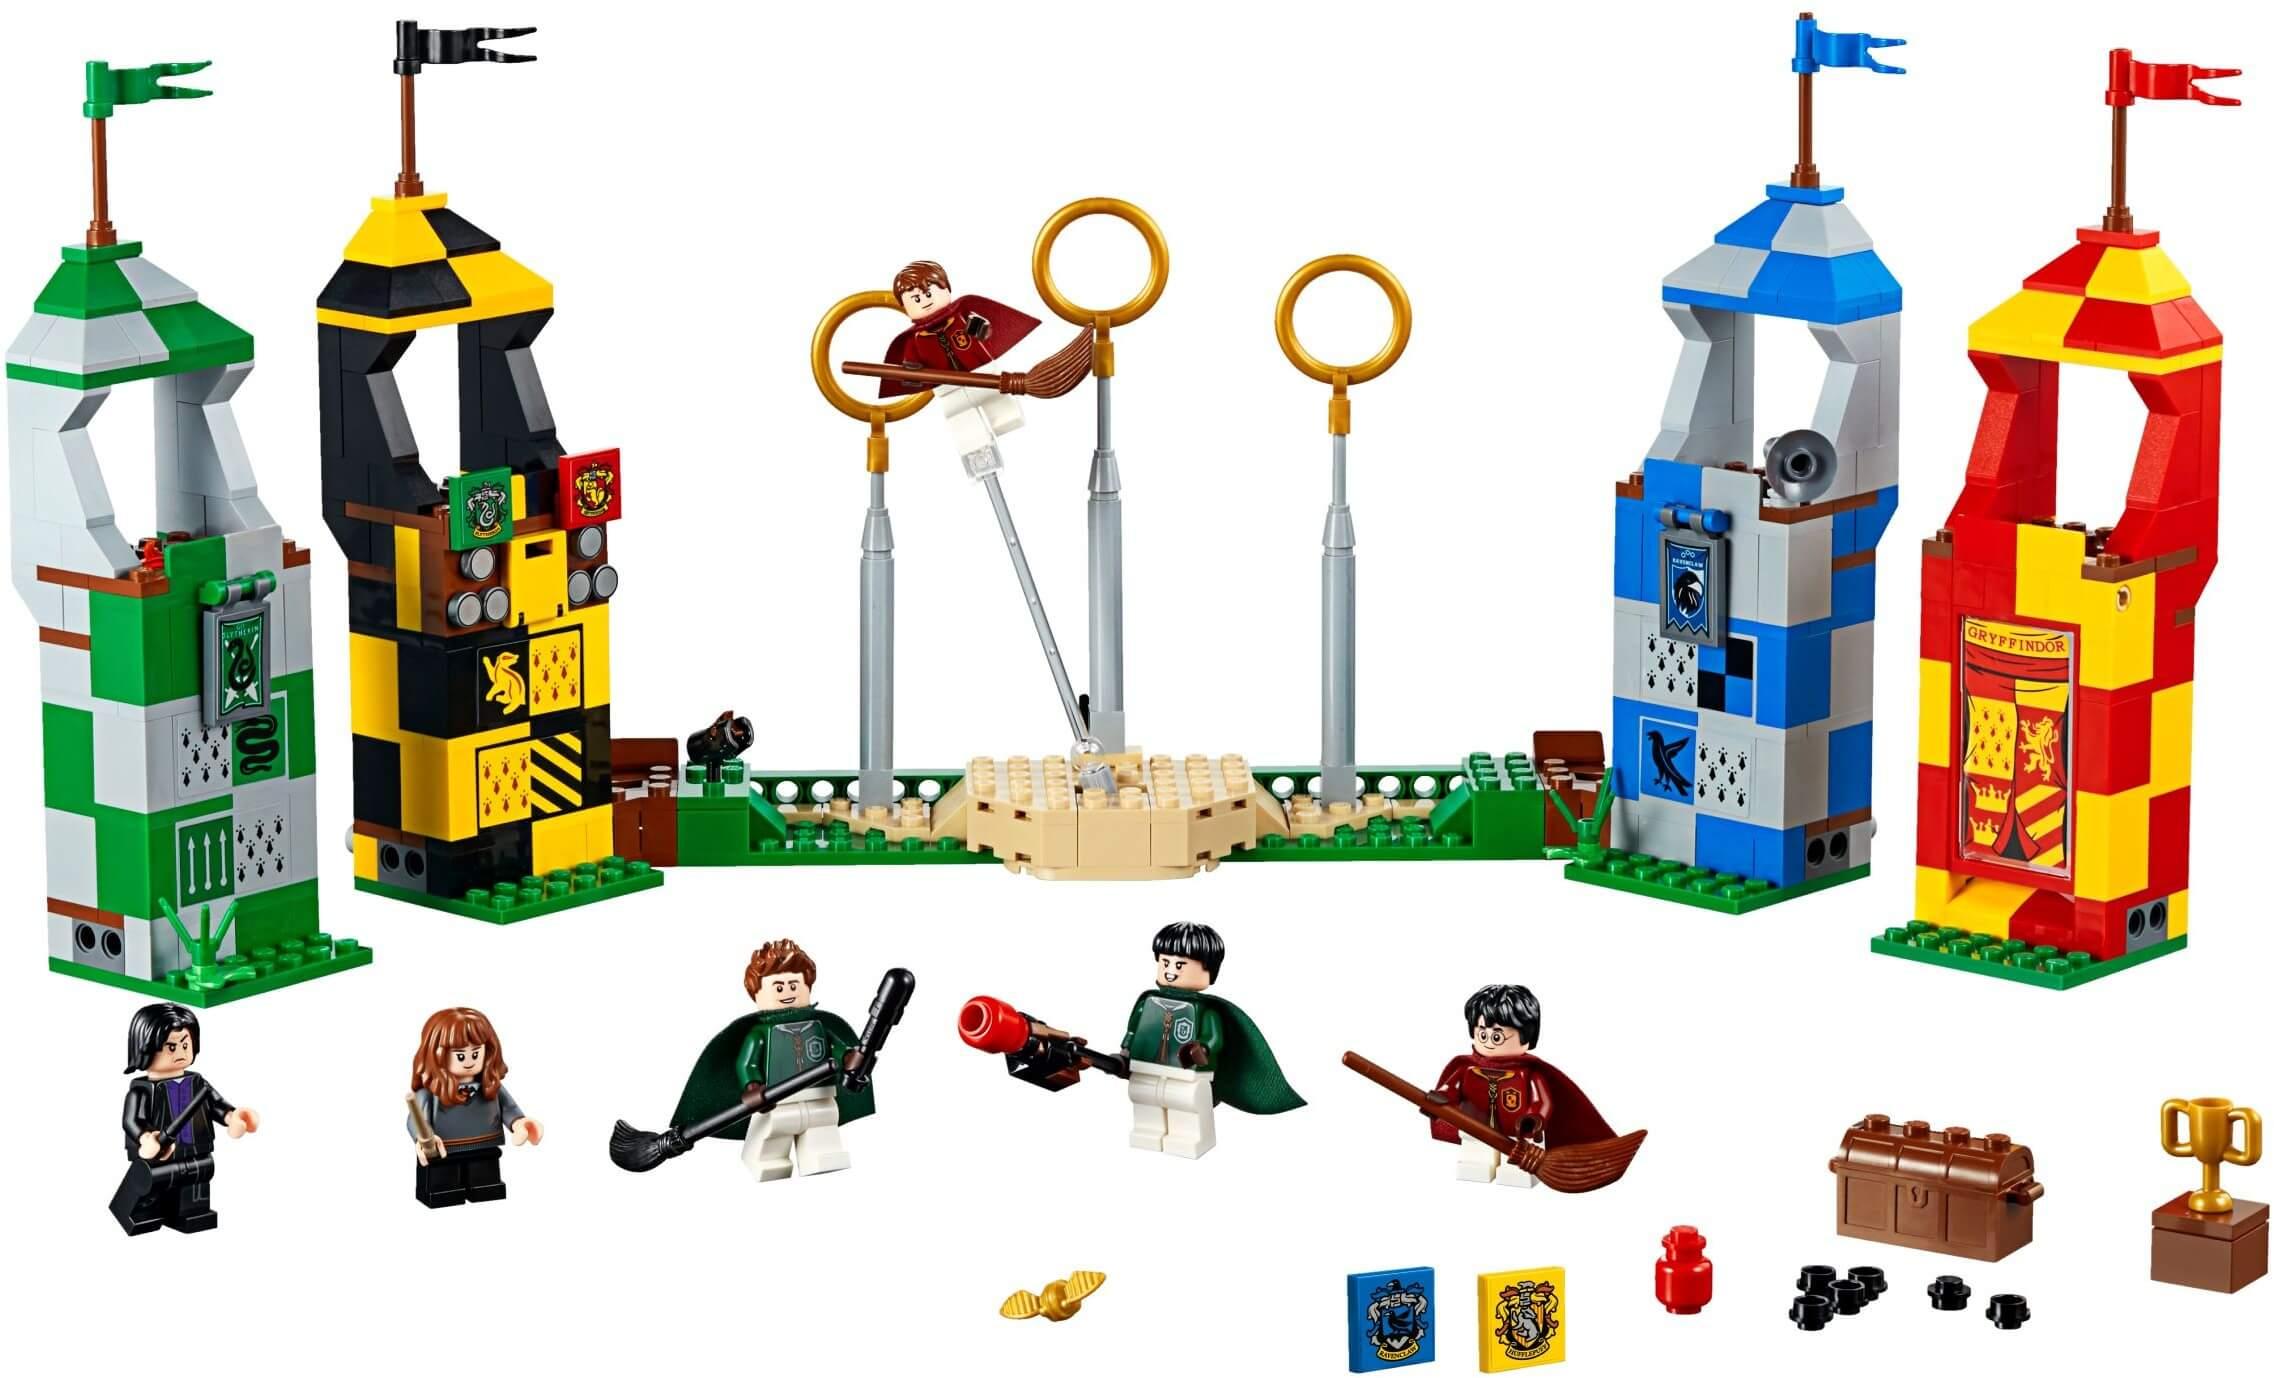 Mua đồ chơi LEGO 75956 - LEGO Harry Potter 75956 - Trận Chung Kết Quidditch (LEGO Harry Potter 75956 Quidditch Match)